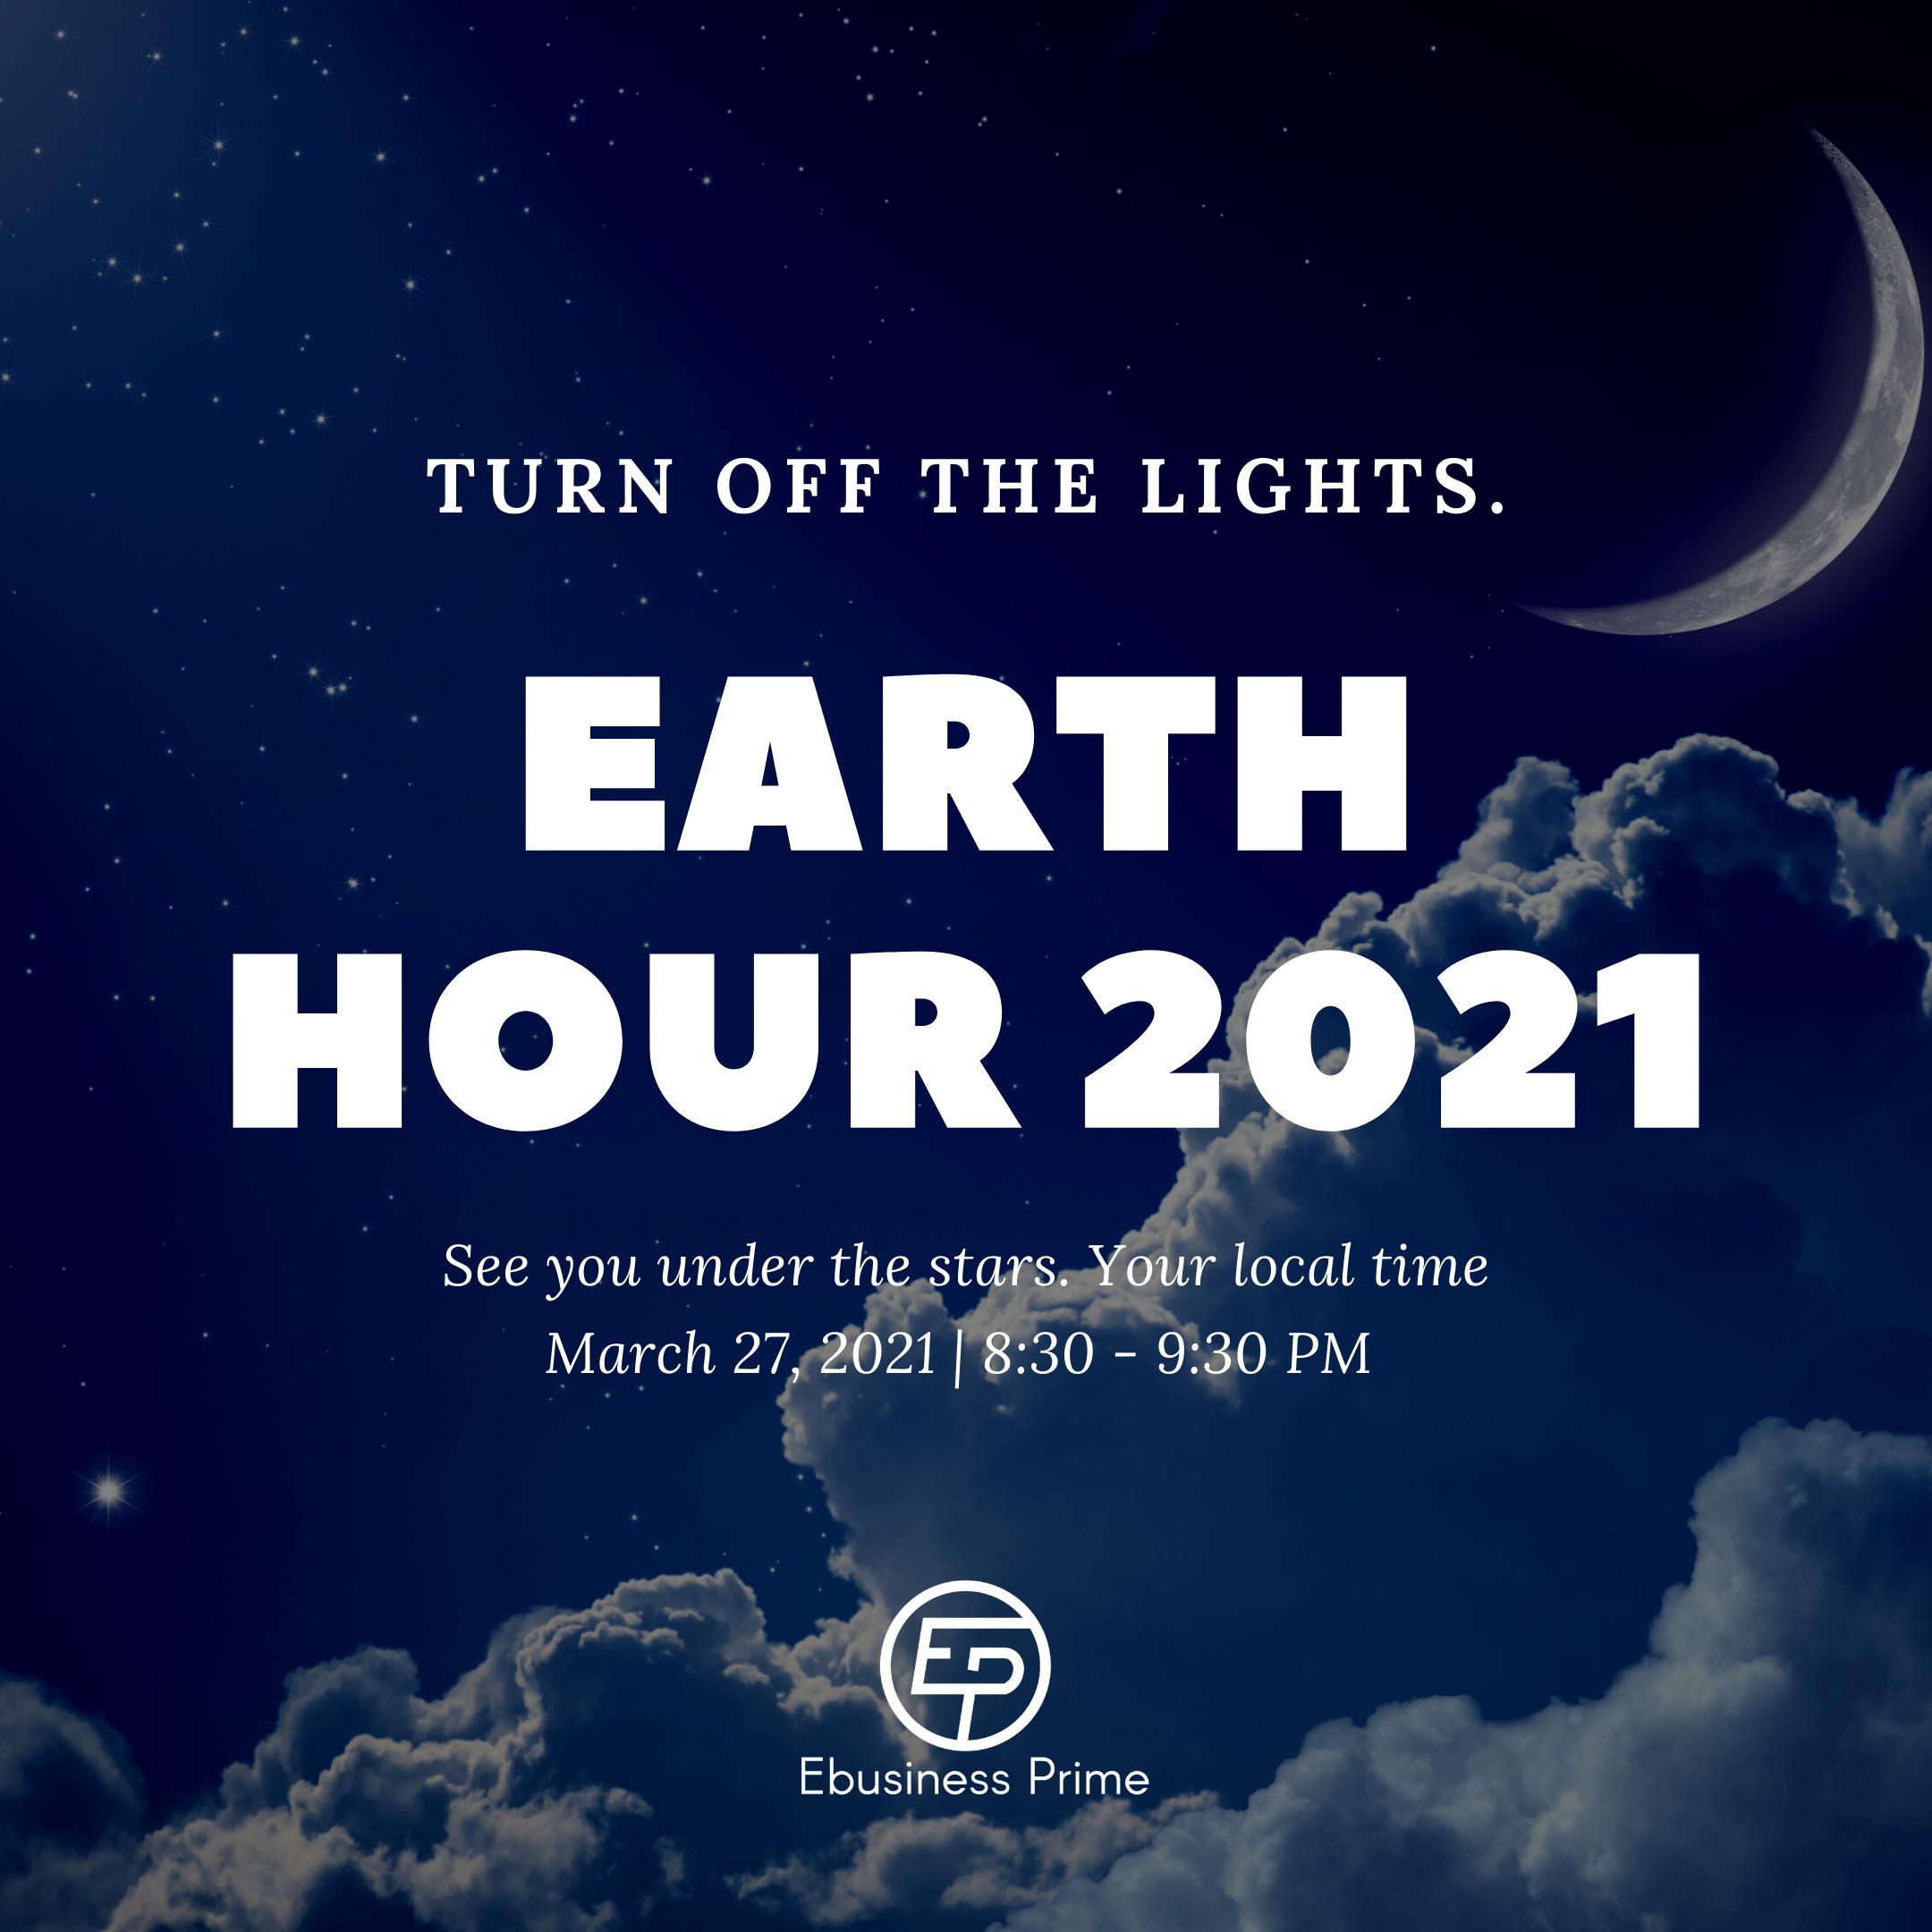 Earth hour 2021